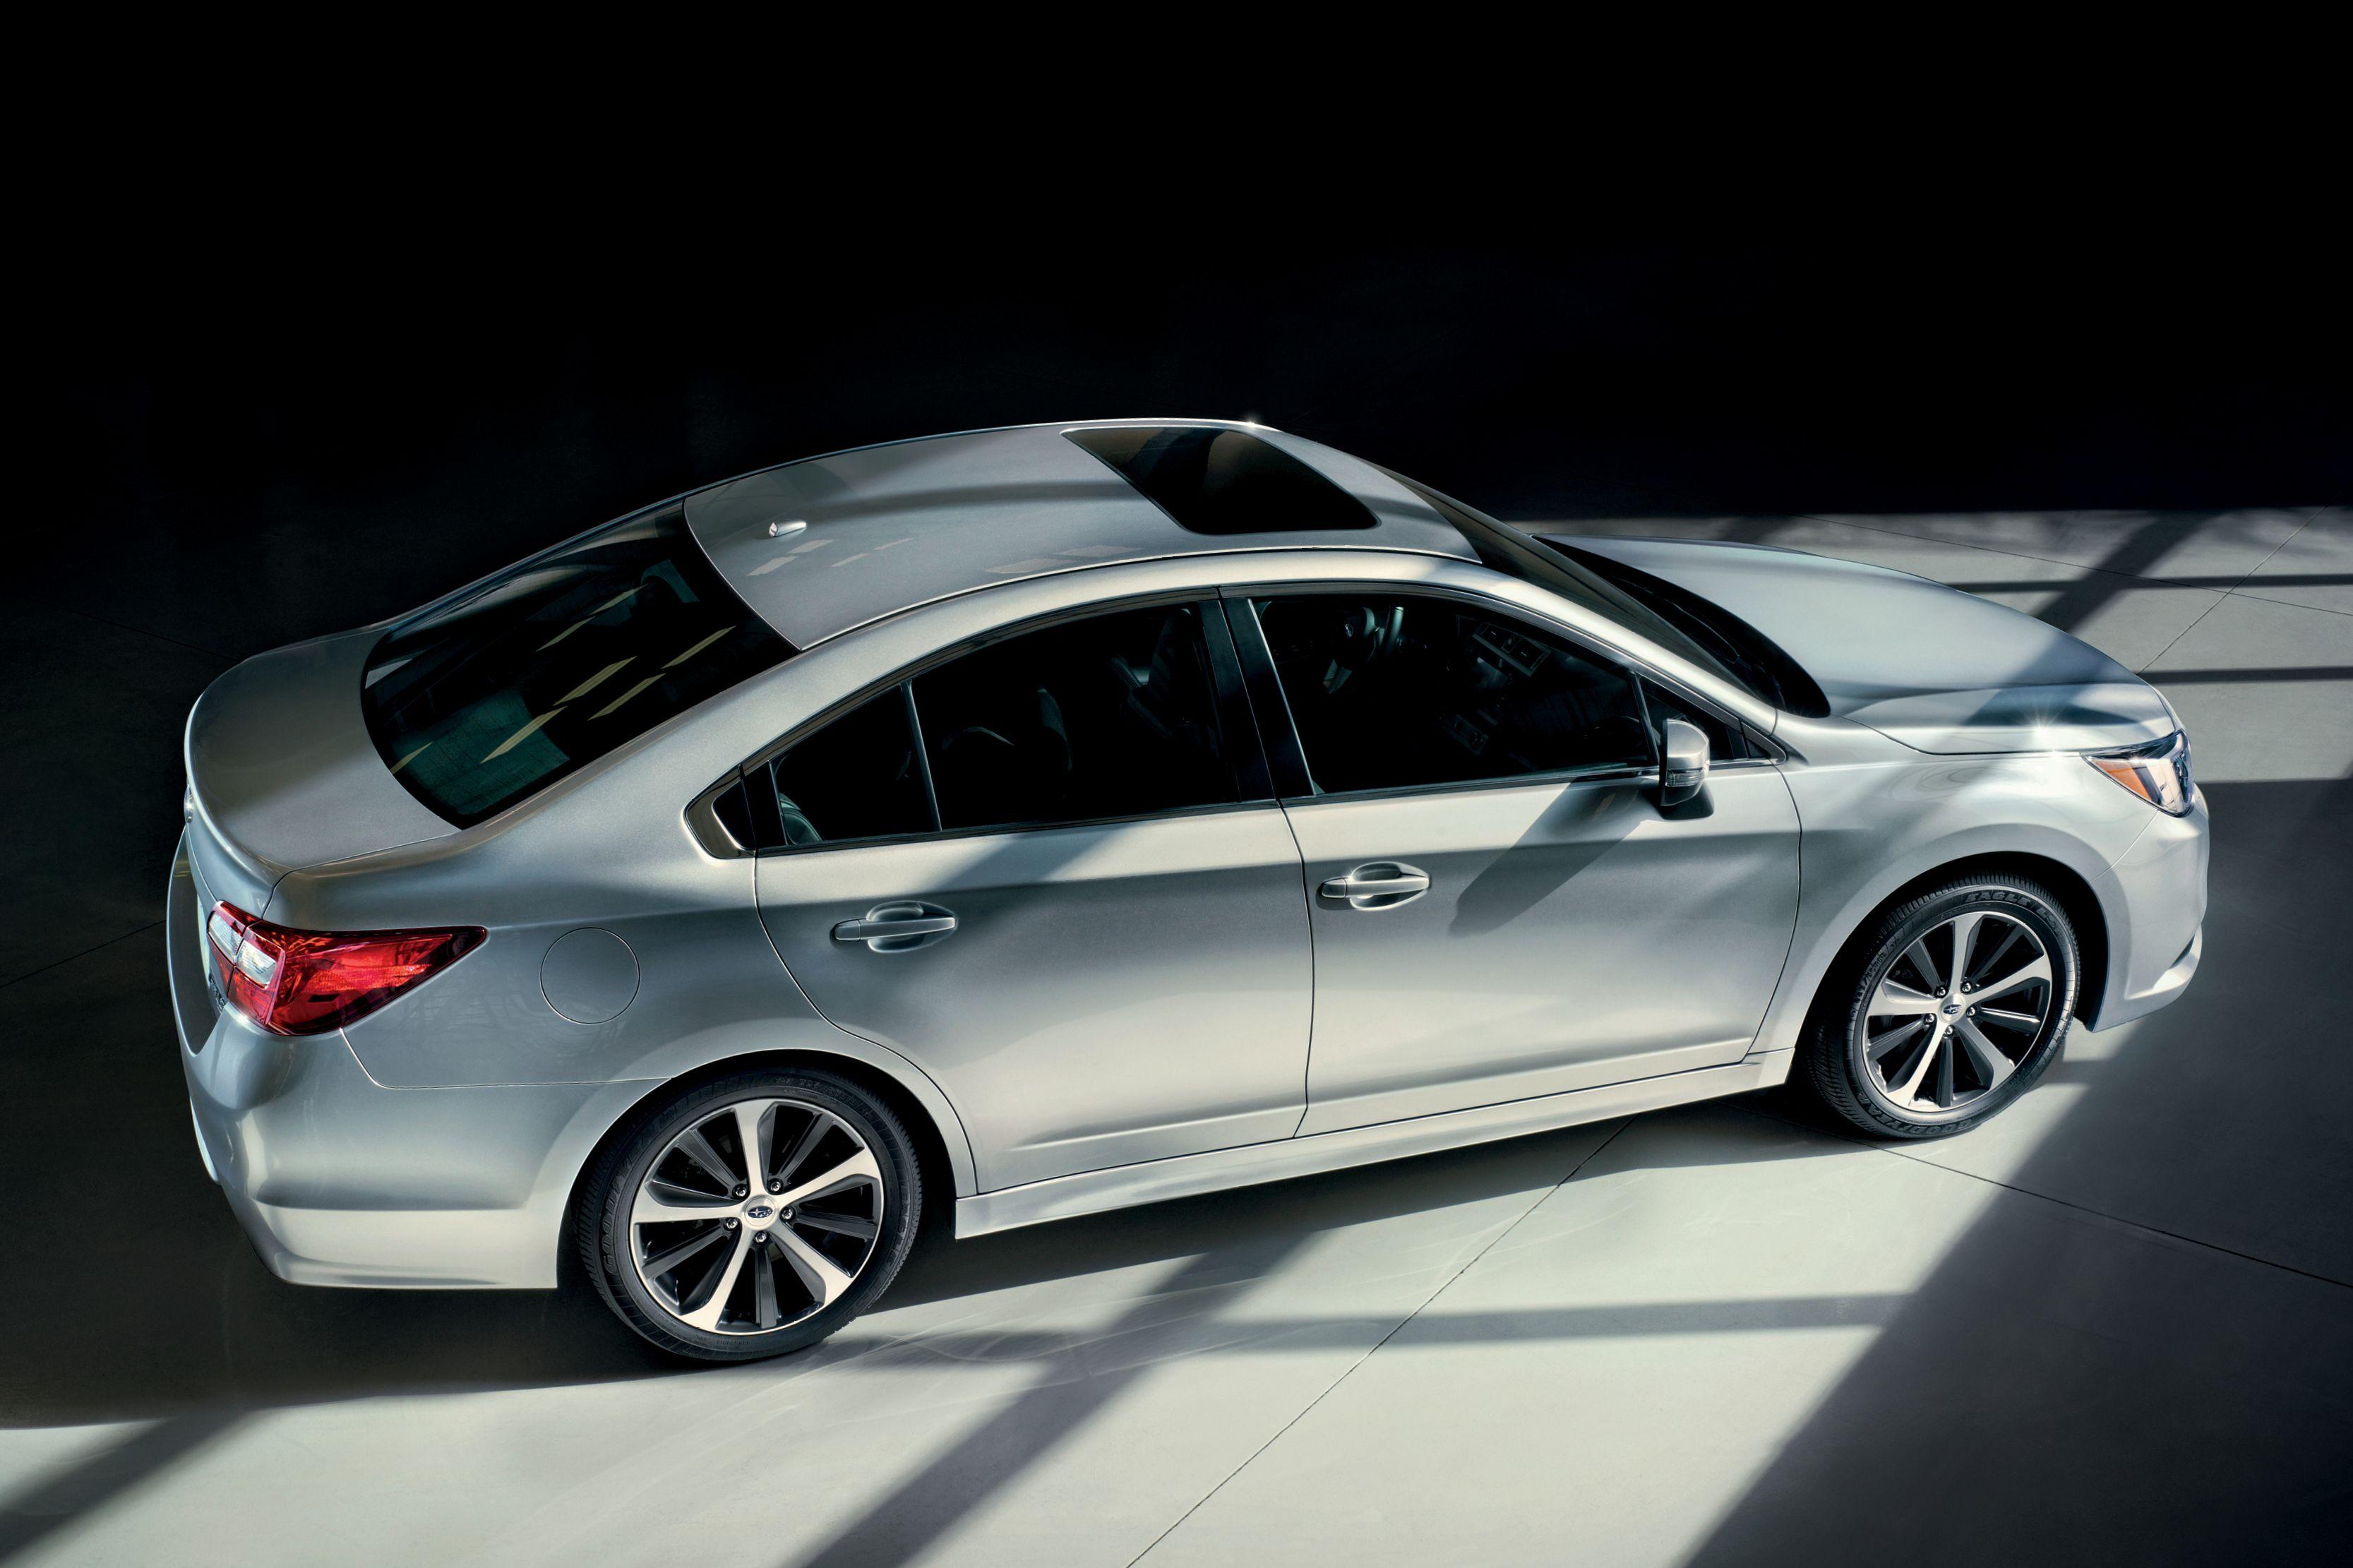 The allnew 2015 Subaru Legacy has new enhanced safety